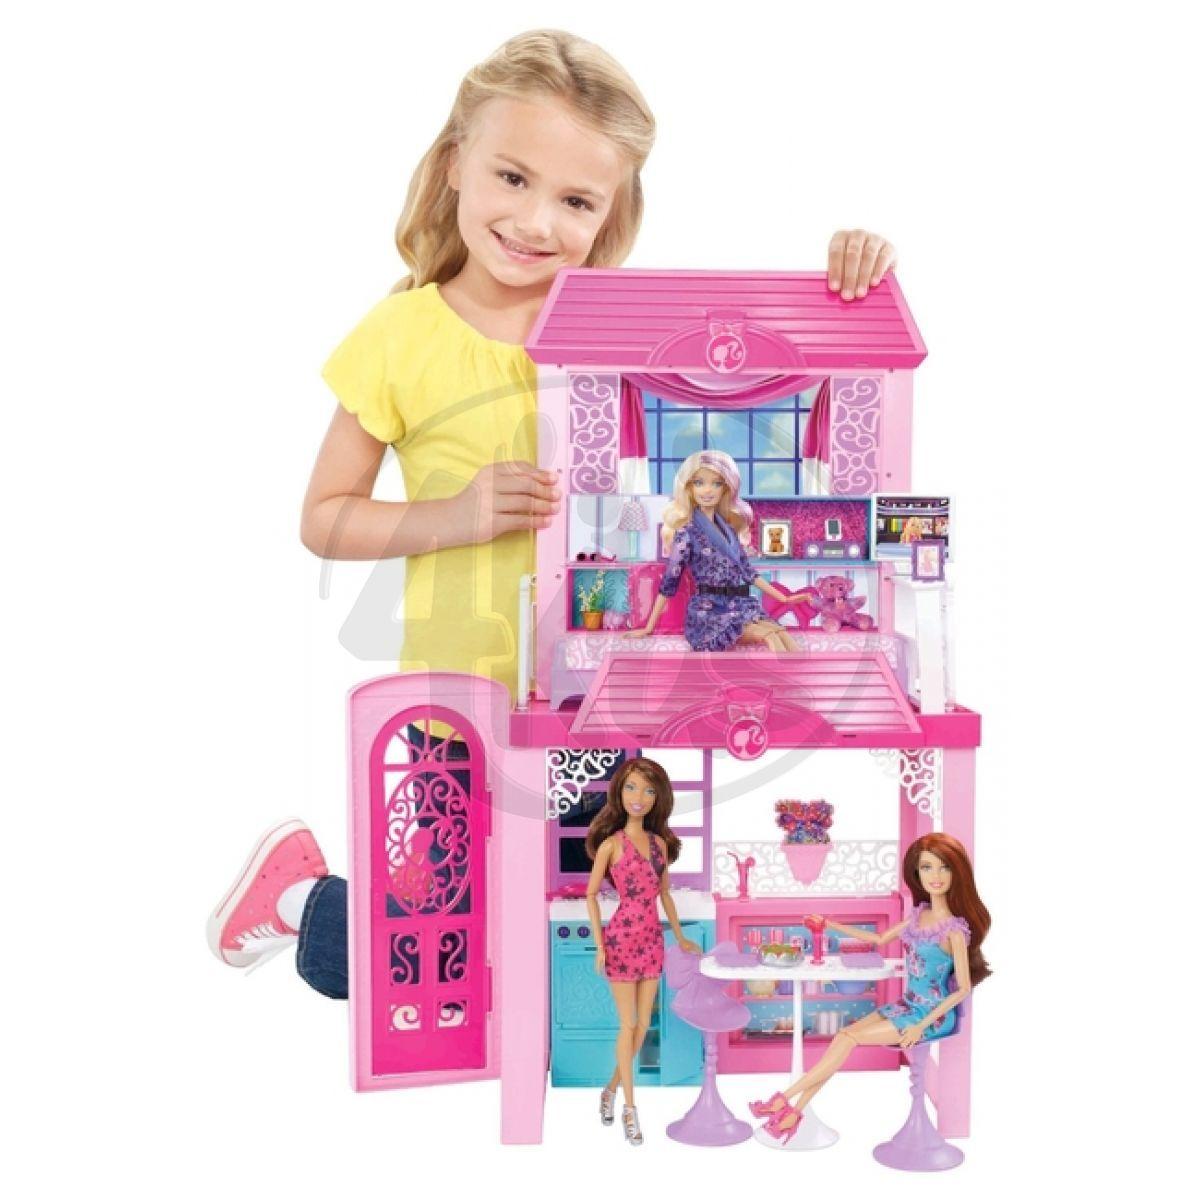 Подарок девочке на 3 года до 1000